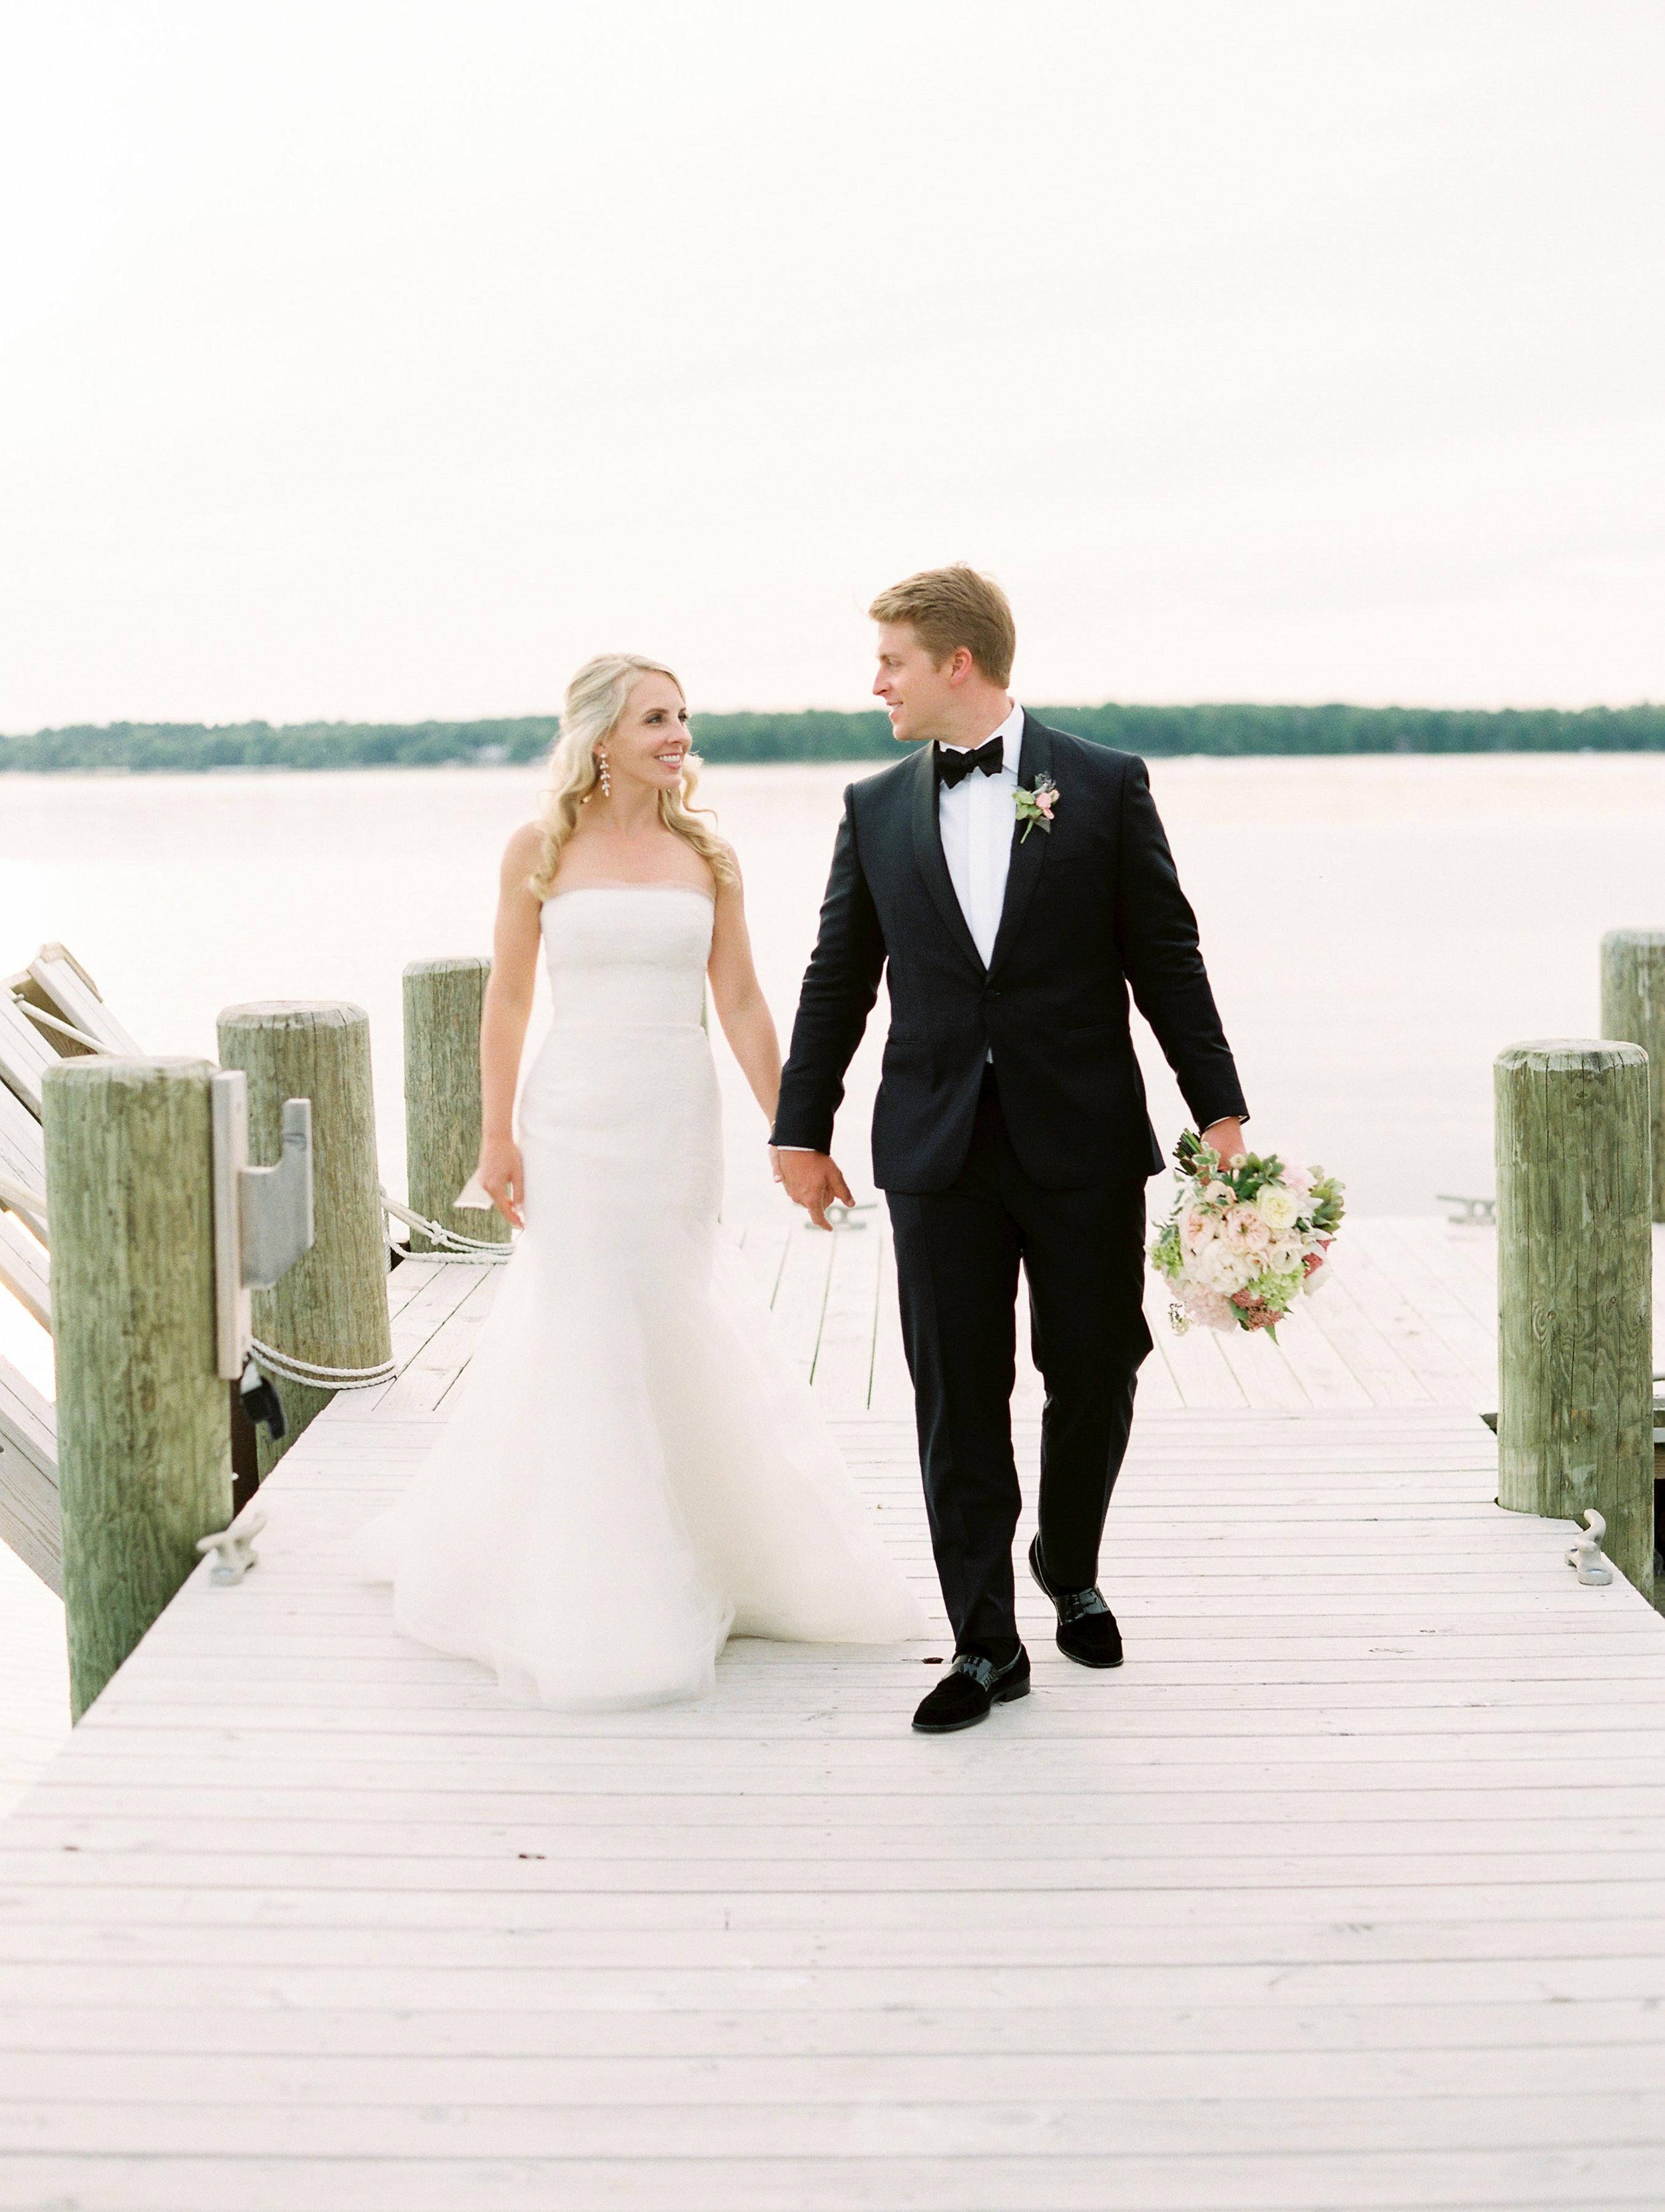 Coffman+Wedding+Bride+Groom+Sunset-75.jpg